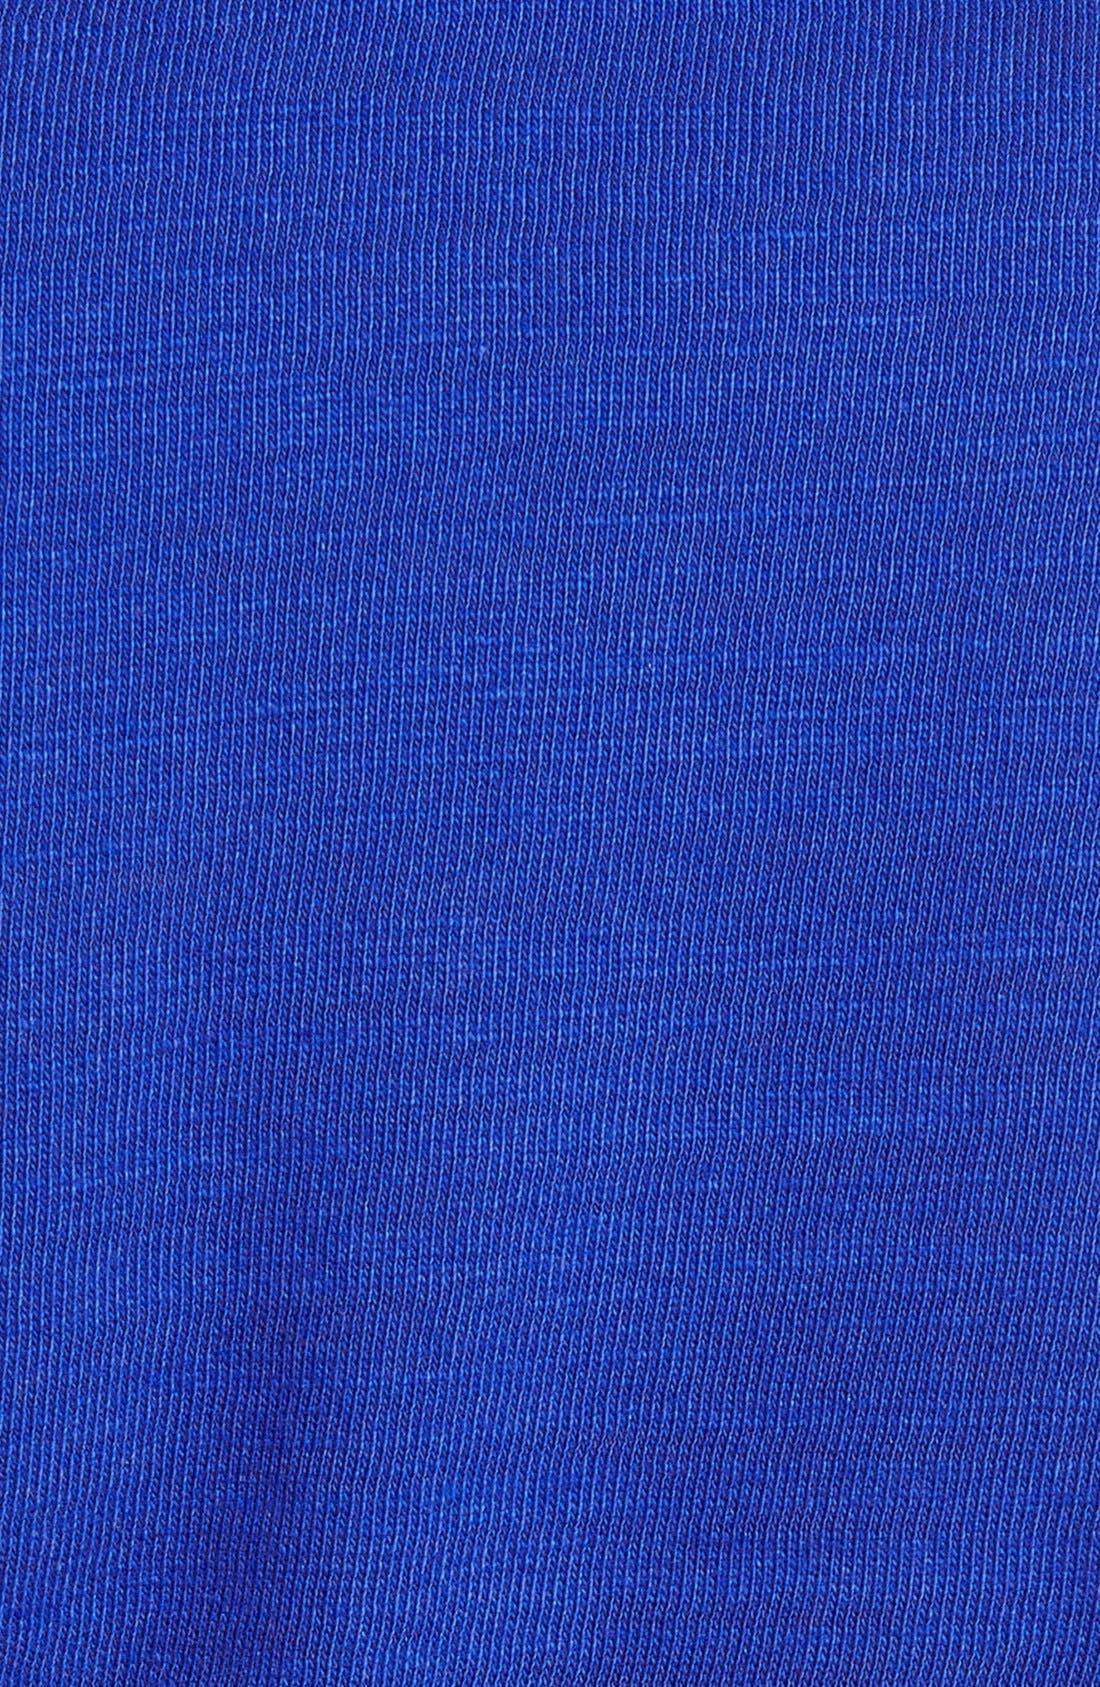 Knit One-Button Blazer,                             Alternate thumbnail 33, color,